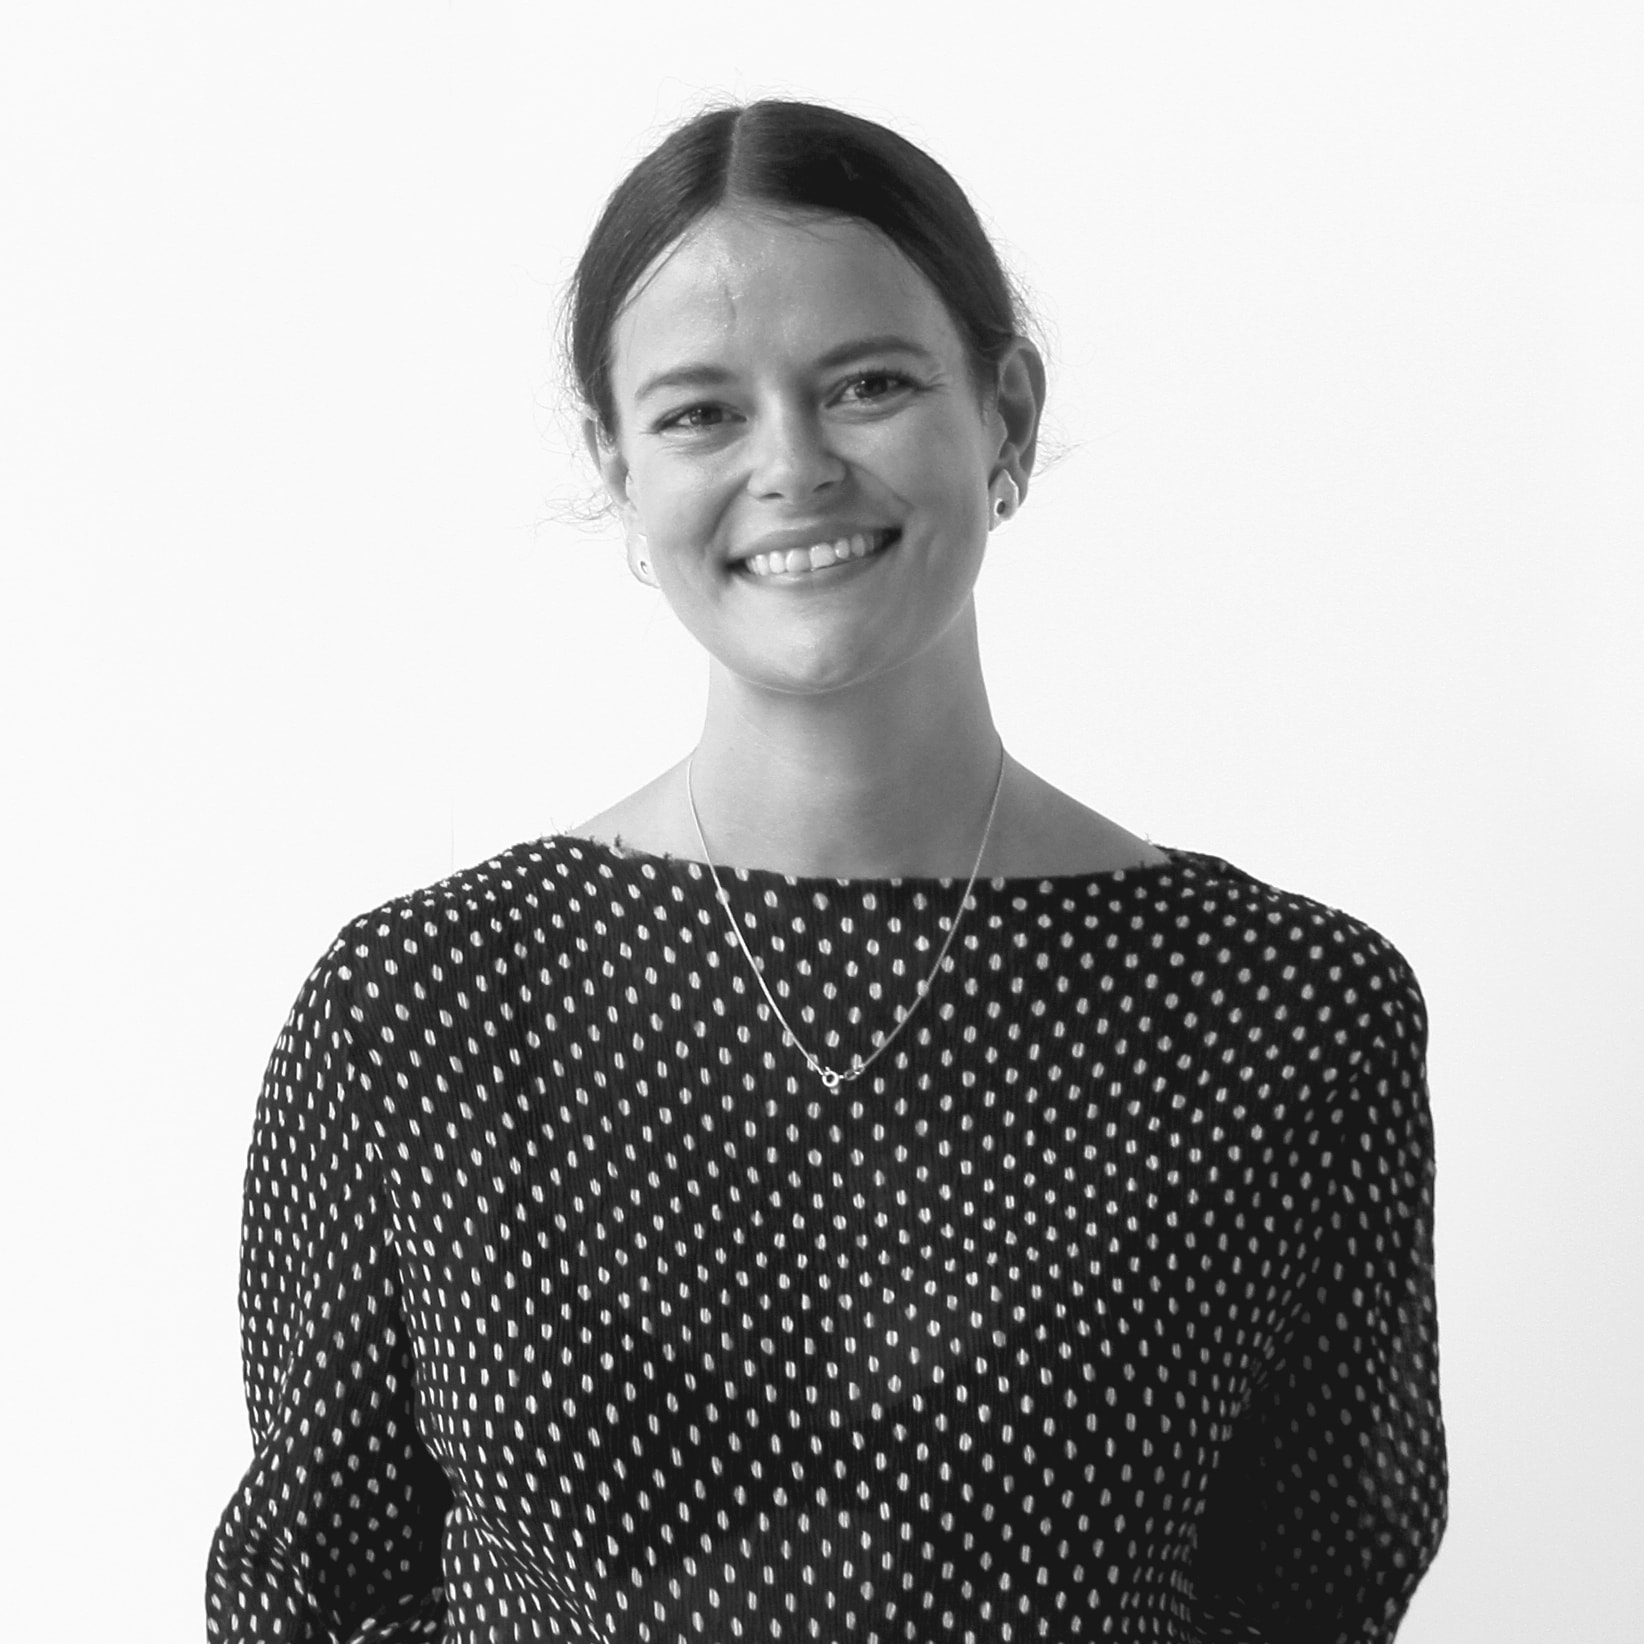 Karoline Liedtke